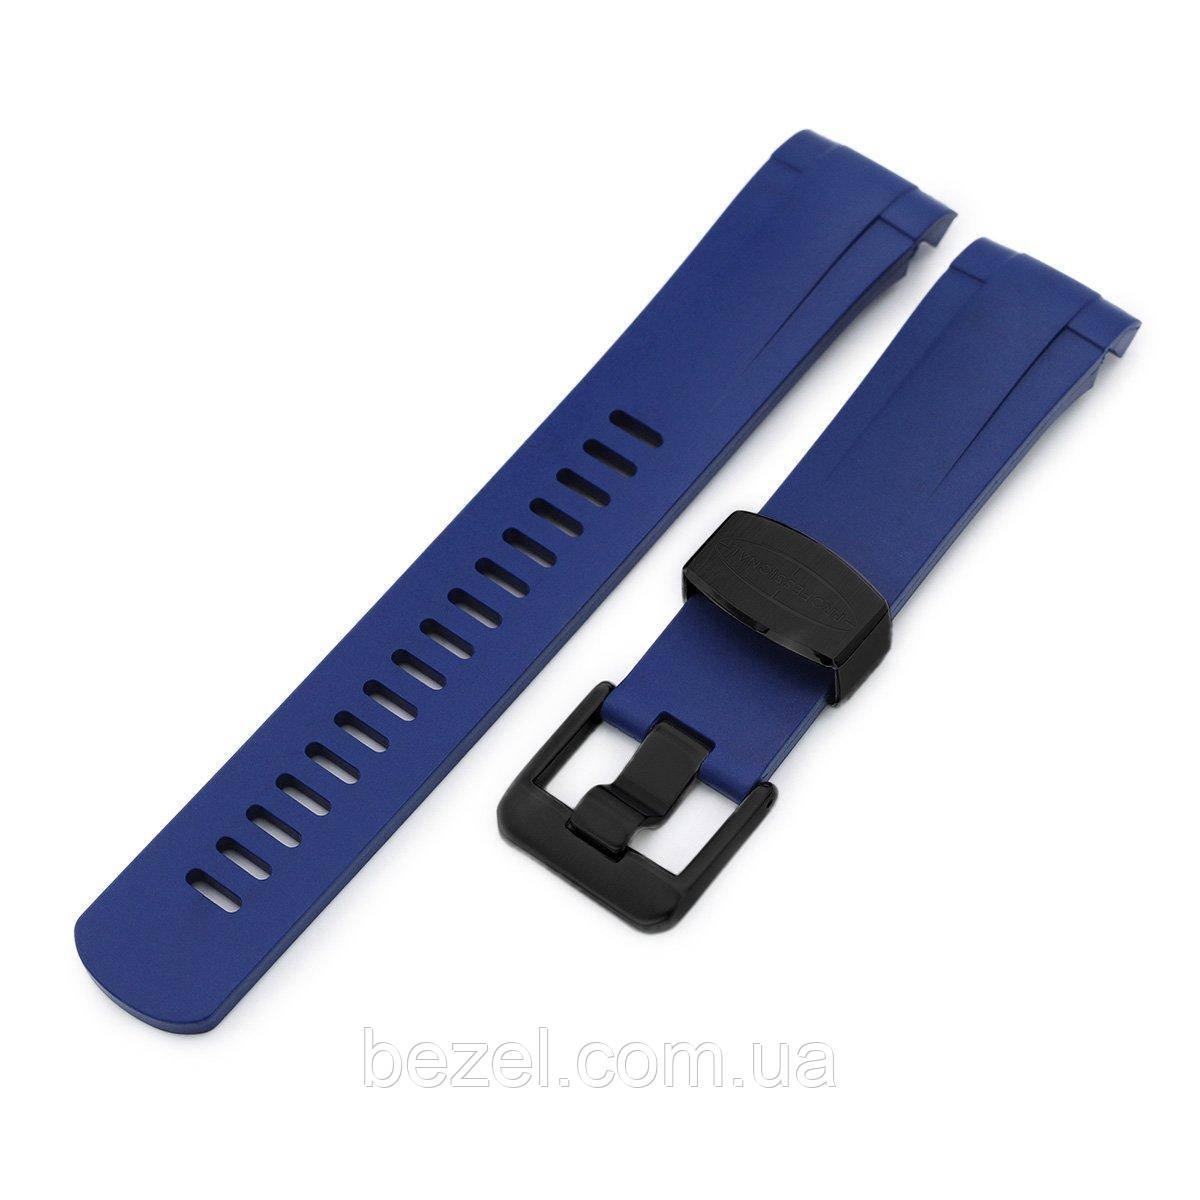 22mm Crafter Blue - Blue Rubber Curved Lug Watch Strap for Tudor Pelagos 25500TN, PVD Black Buckle